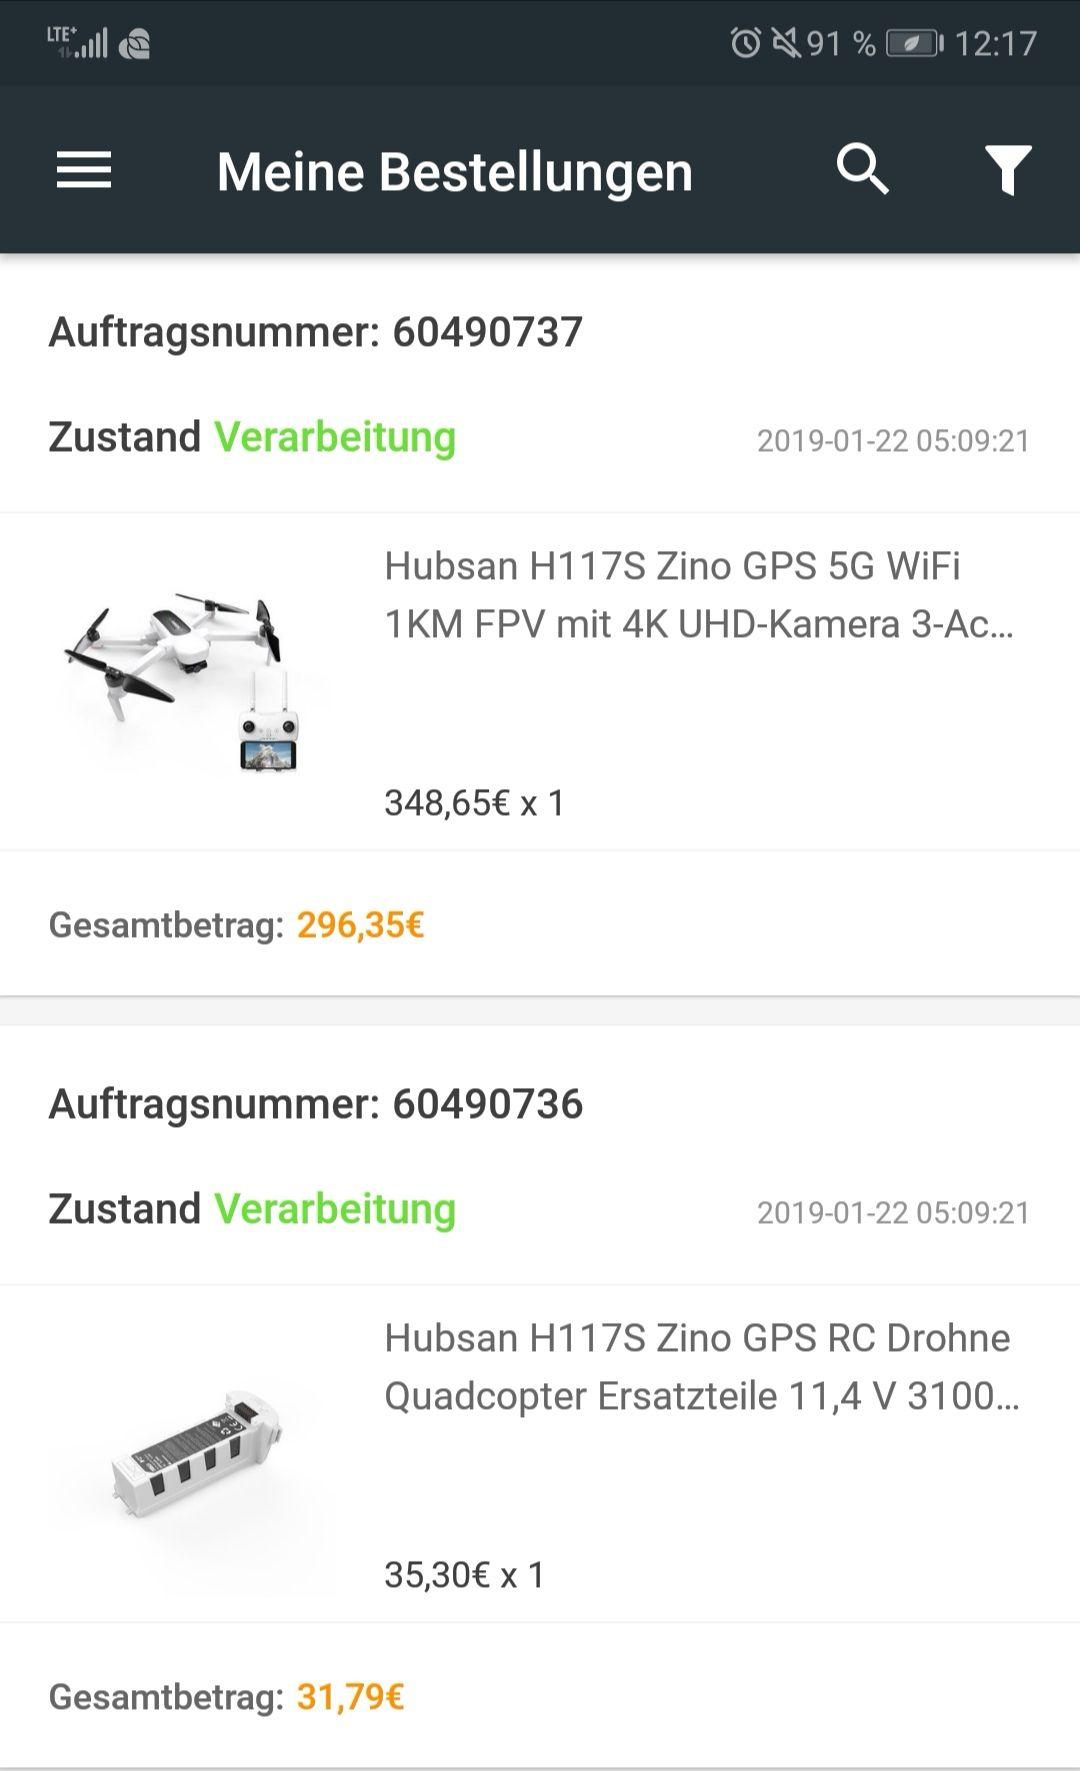 Hubsan Zino Drohne Drone Multikopter zum Bestpreis